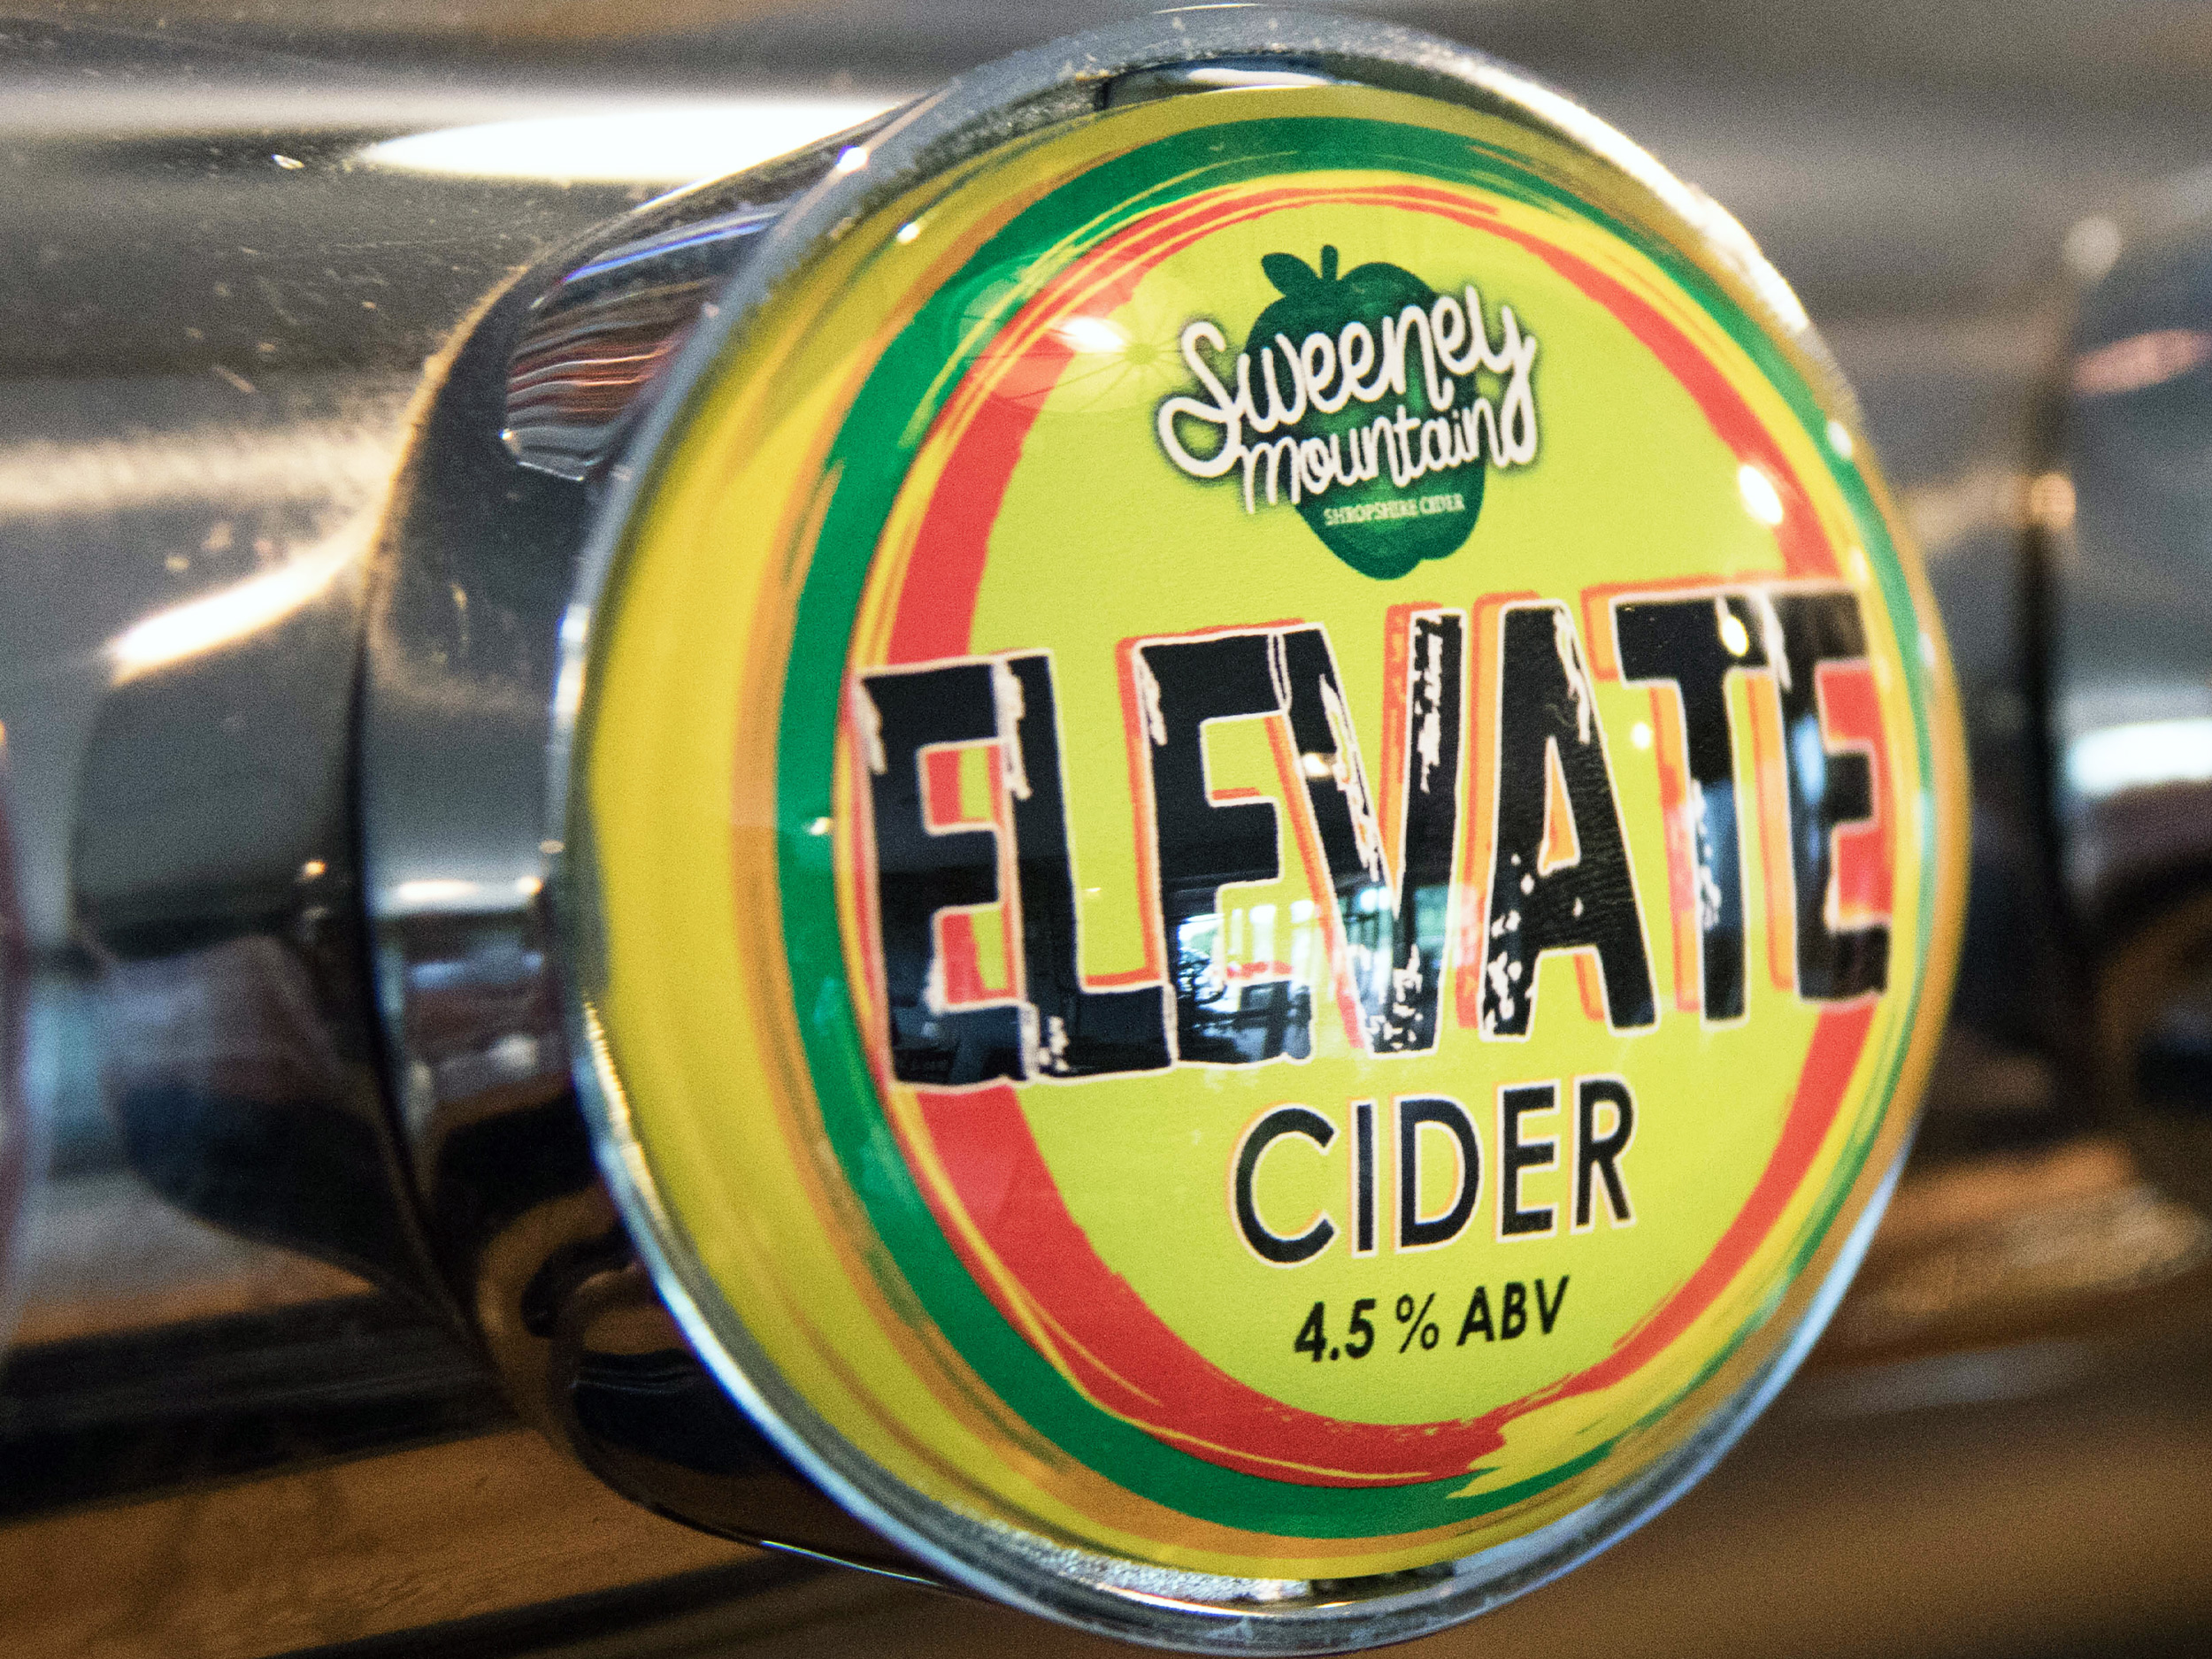 Elevate Cider pump clip